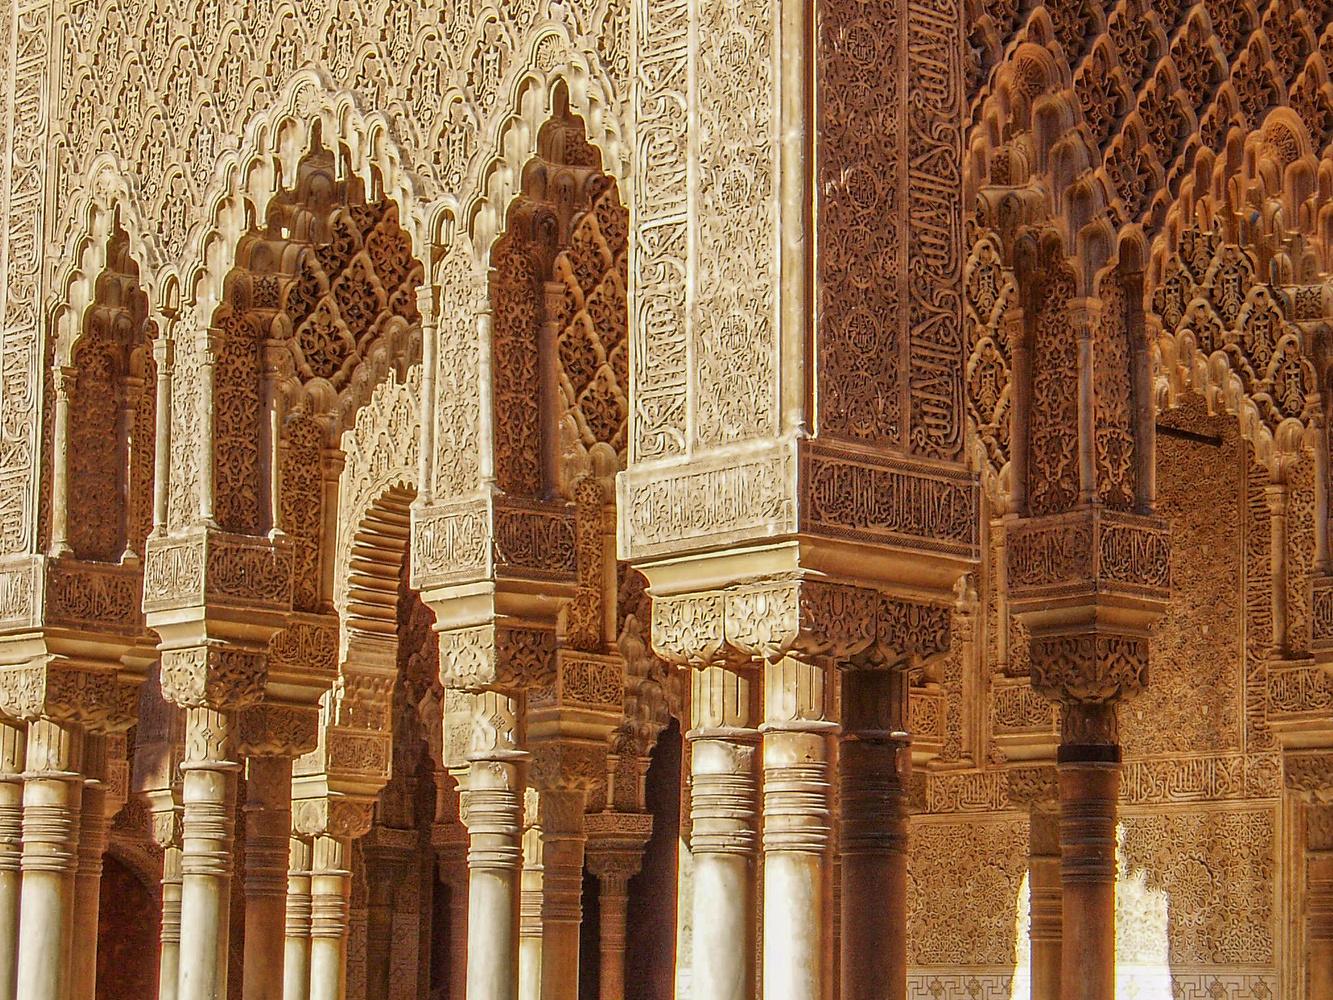 Alhambra arches by Melanie Knight